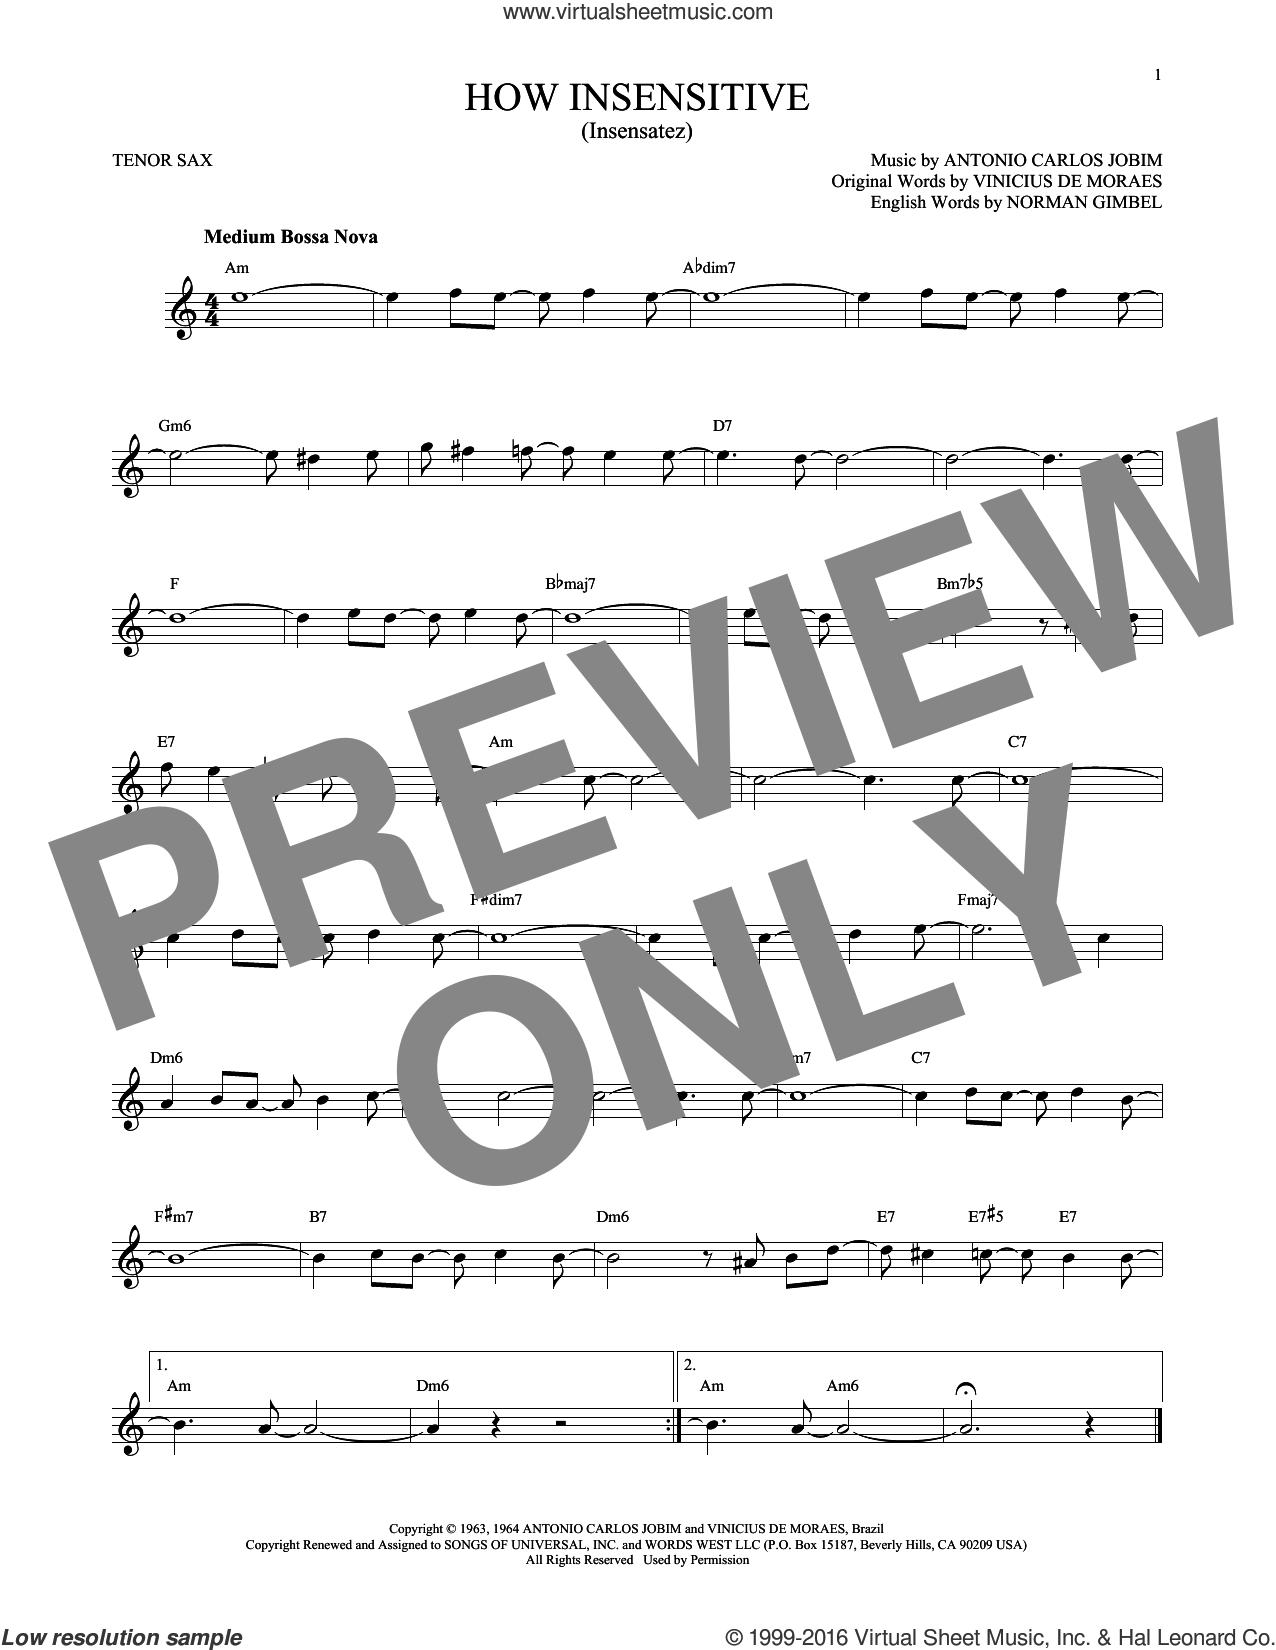 How Insensitive (Insensatez) sheet music for tenor saxophone solo by Norman Gimbel, Astrud Gilberto, Antonio Carlos Jobim and Vinicius de Moraes, intermediate skill level